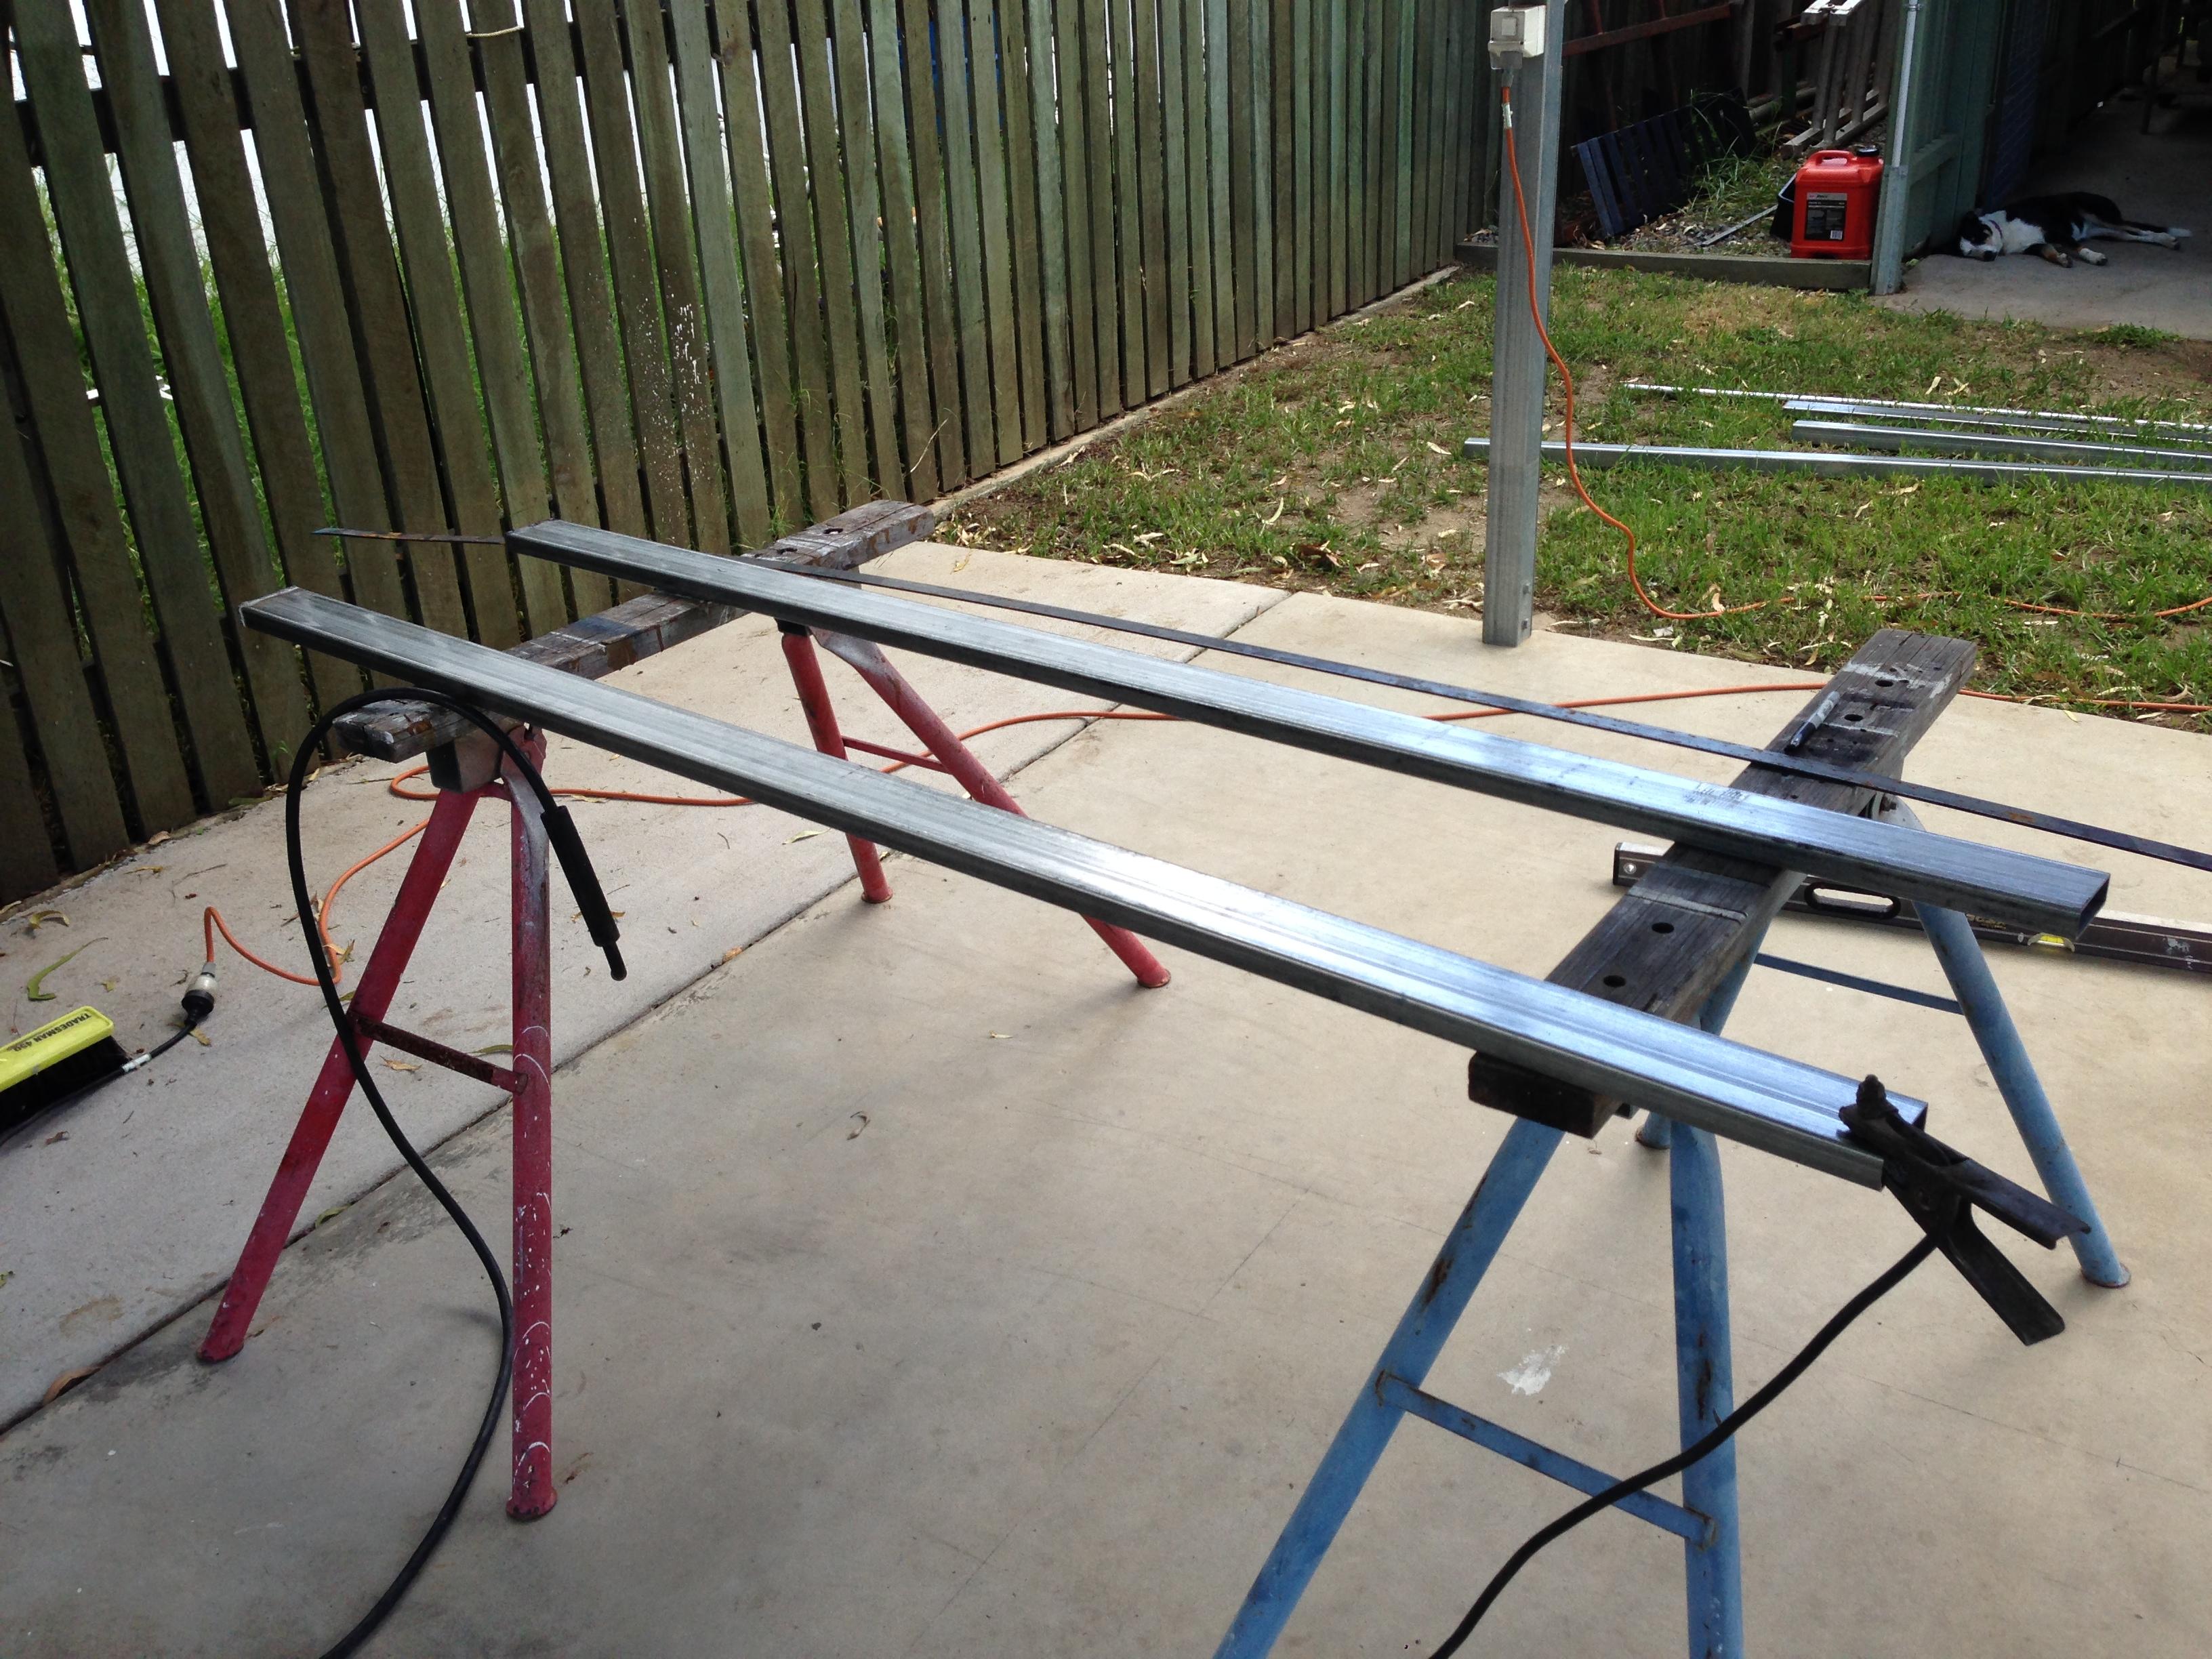 Combing rails